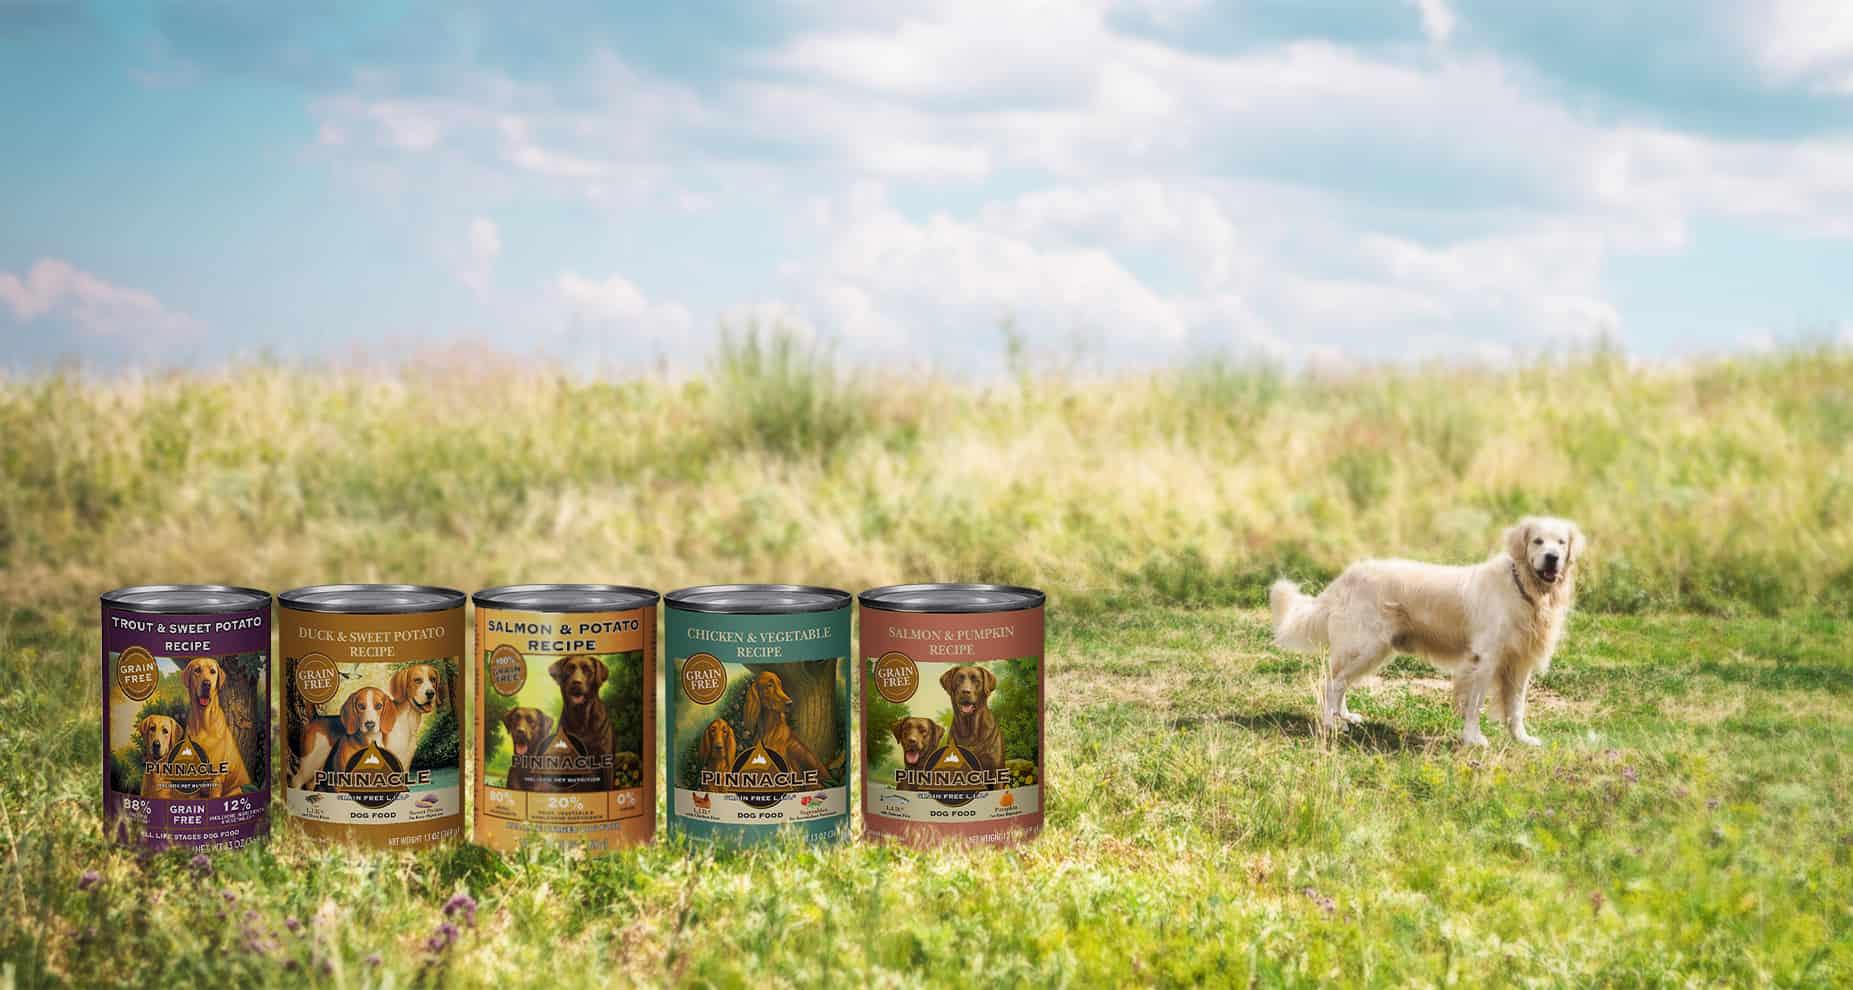 Pinnacle Dog Food: 2020 Review, Recalls & Coupons 6